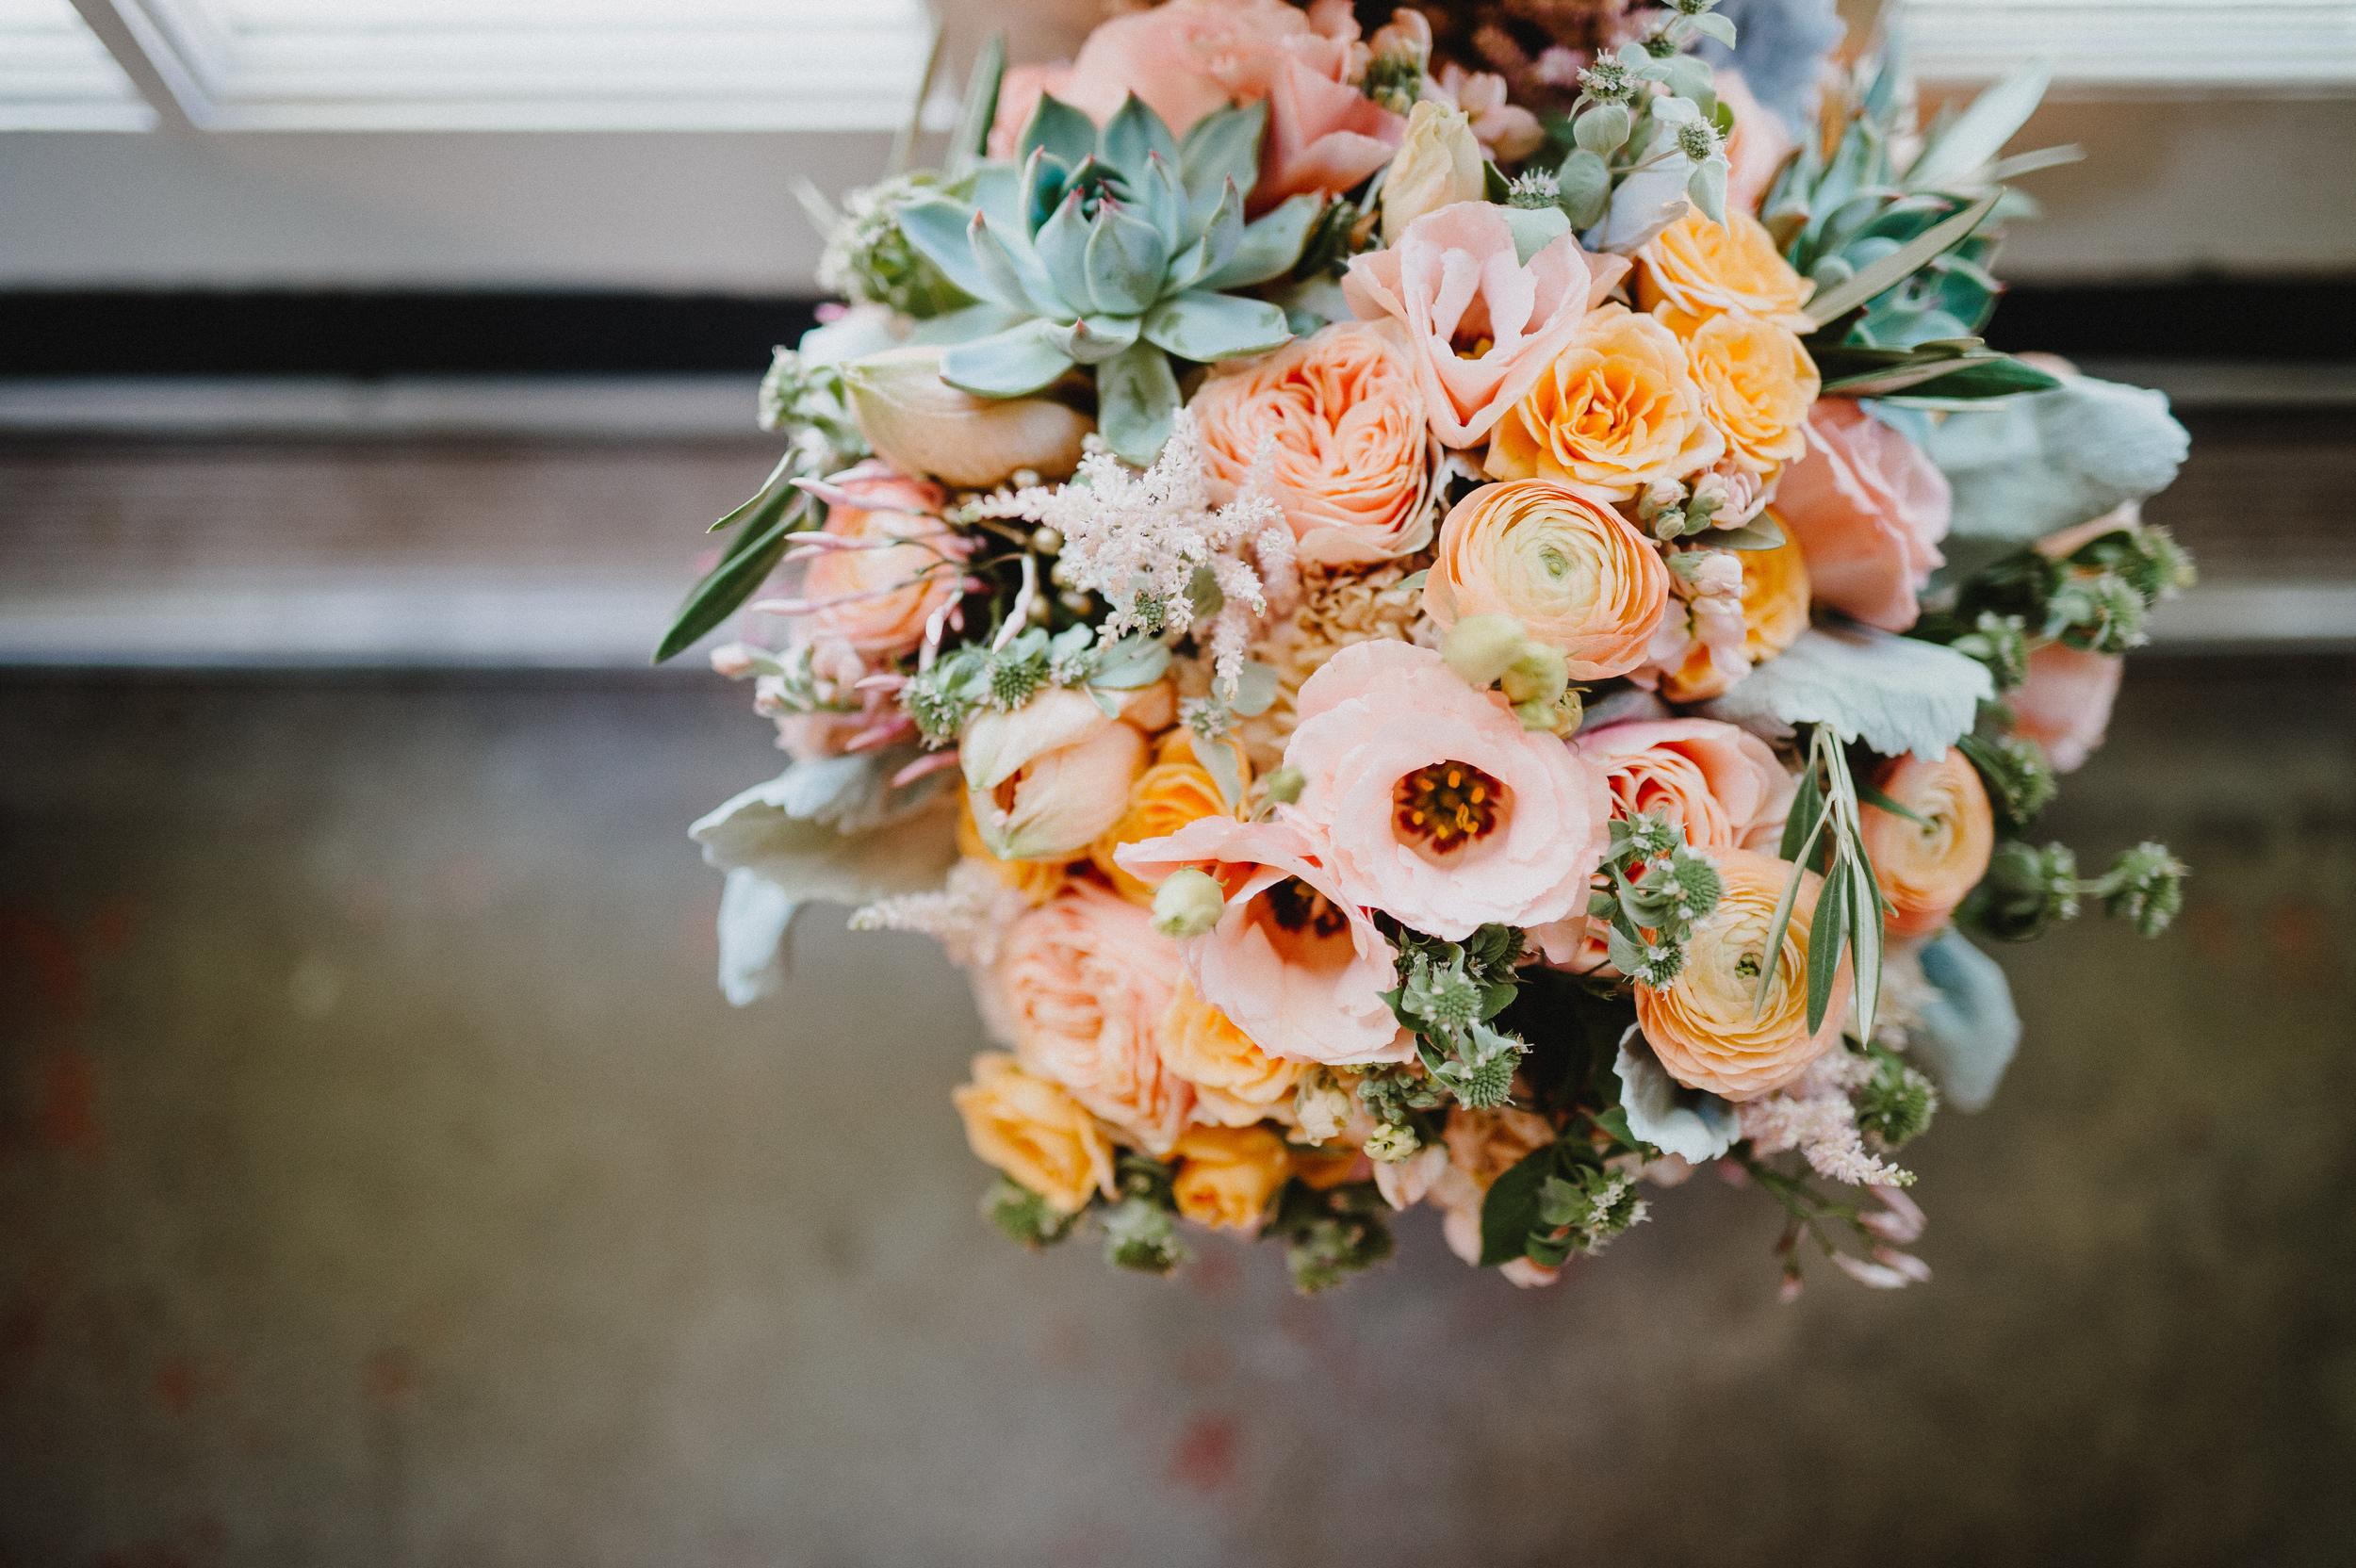 holly-hedge-estate-wedding-photographer-pat-robinson-photography-4.jpg